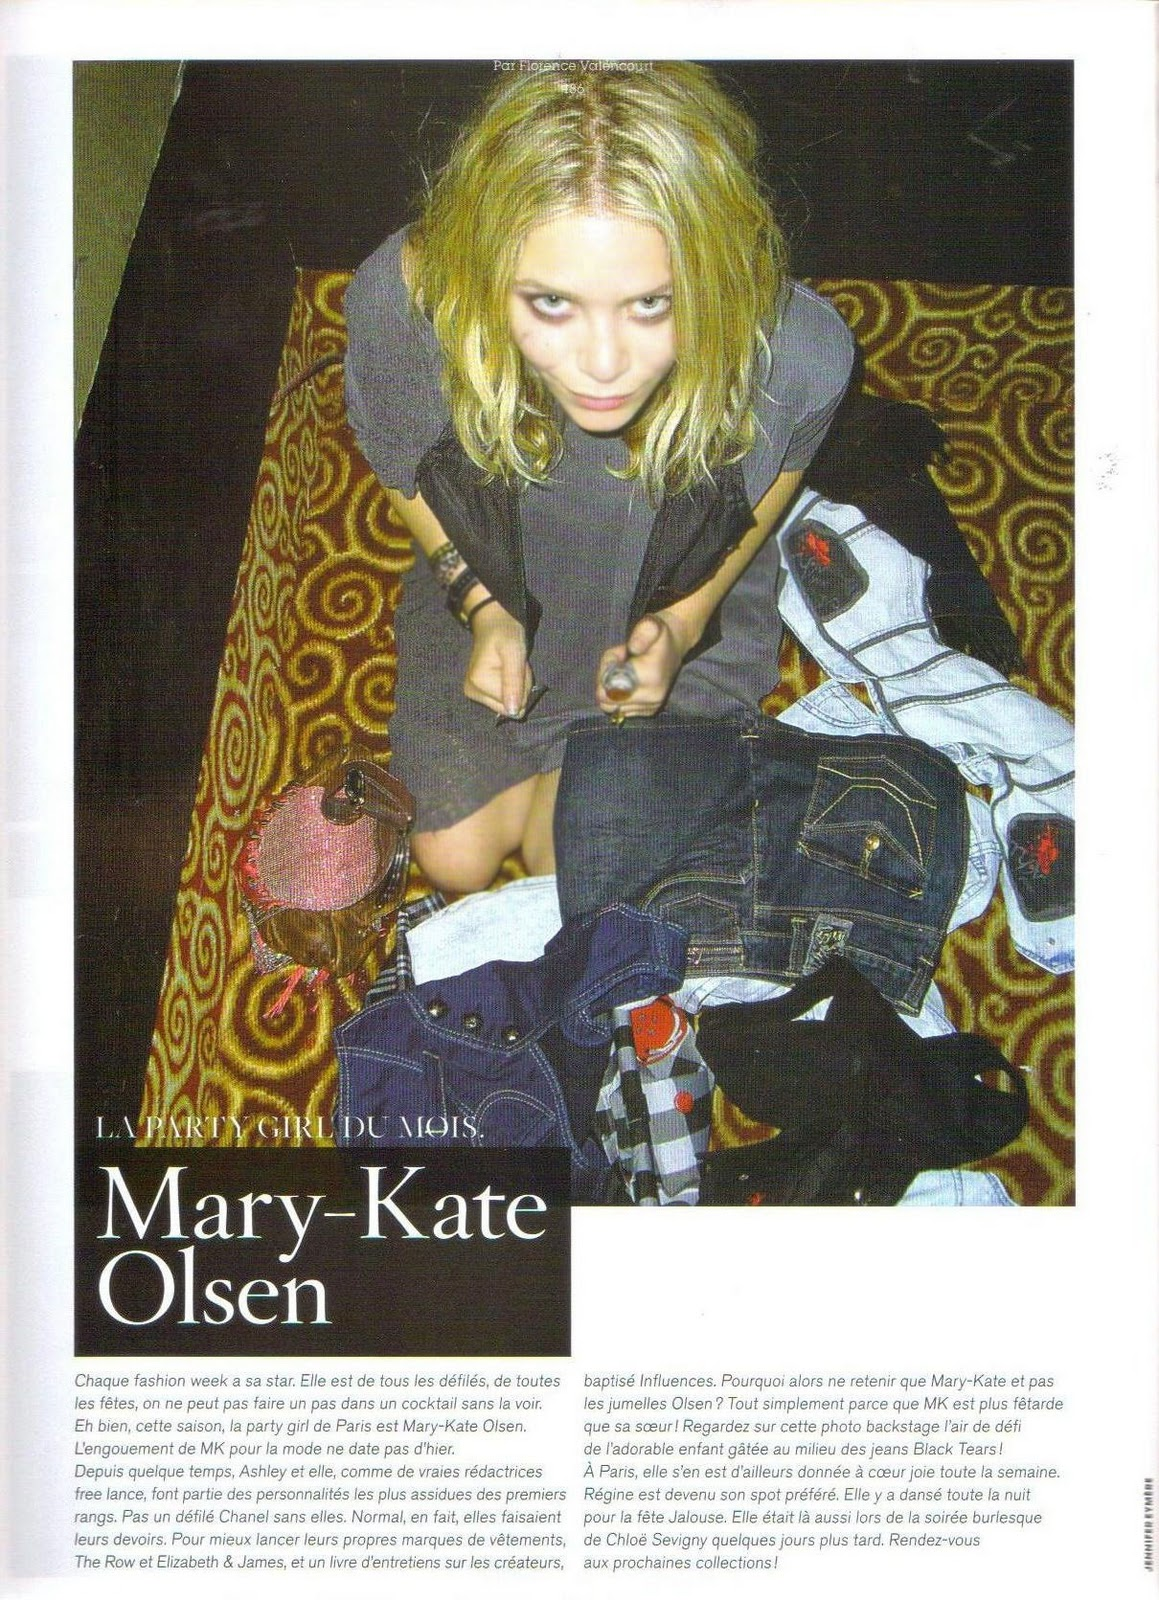 http://1.bp.blogspot.com/_EIo0NdJIWOE/TT77yWqB99I/AAAAAAAAAKU/O4eamLP2cm4/s1600/mary-kate-olsen-jalouse-magazine-scan.jpg